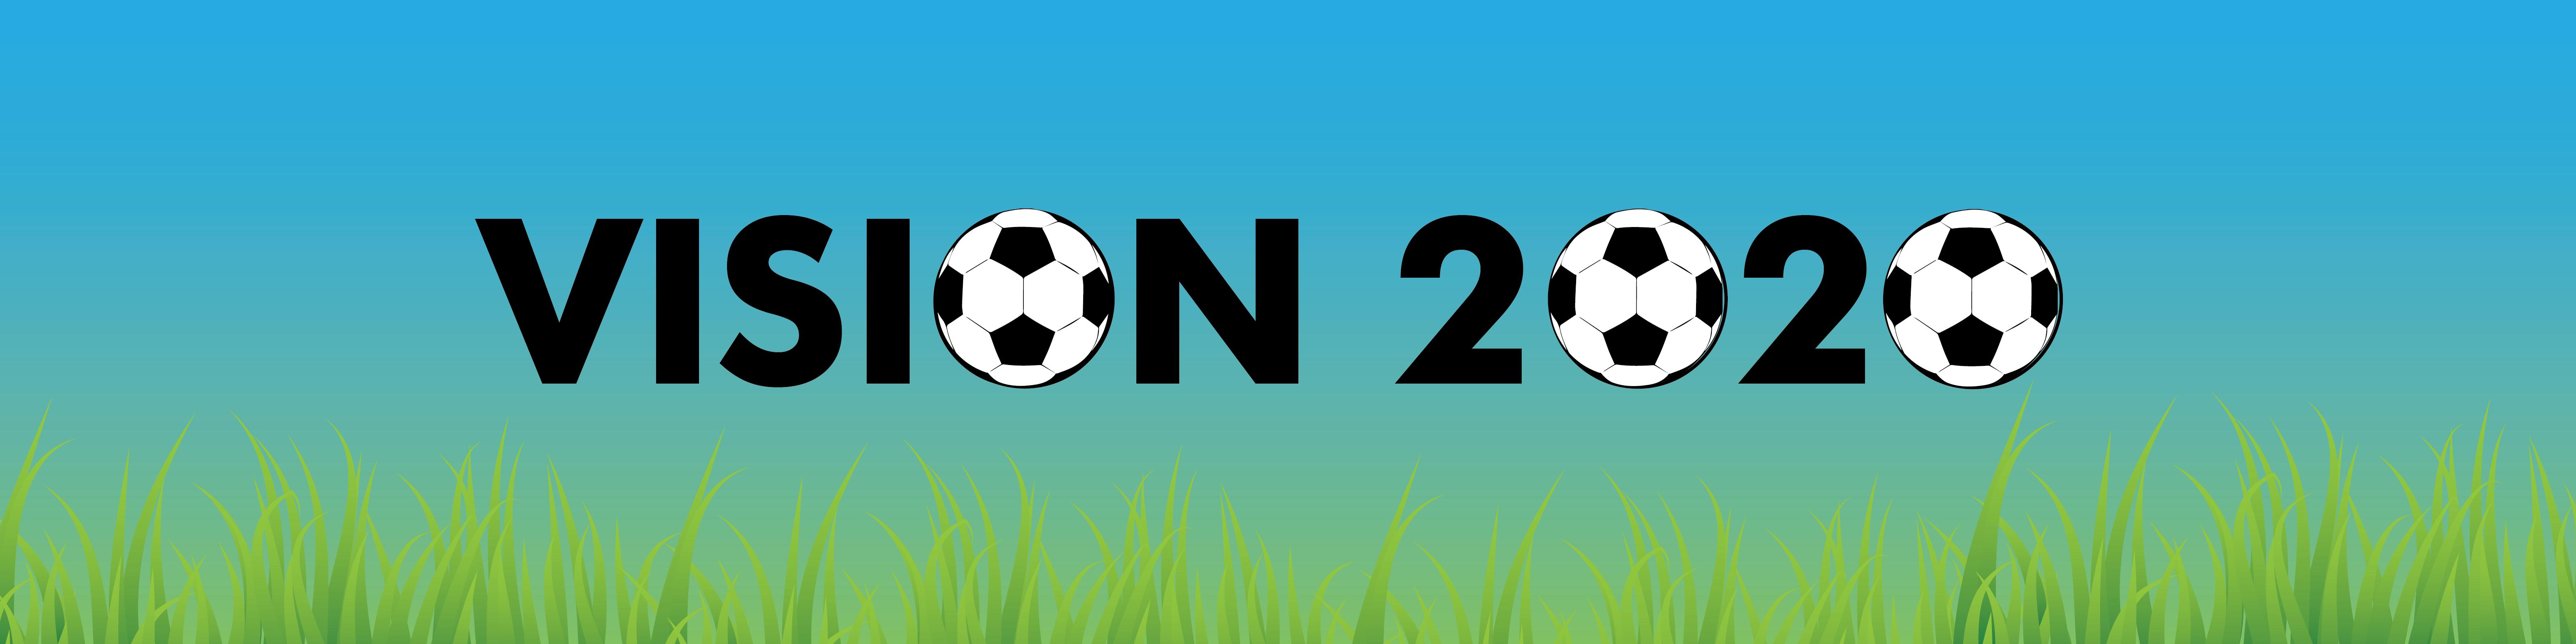 Vision2020_2020-01